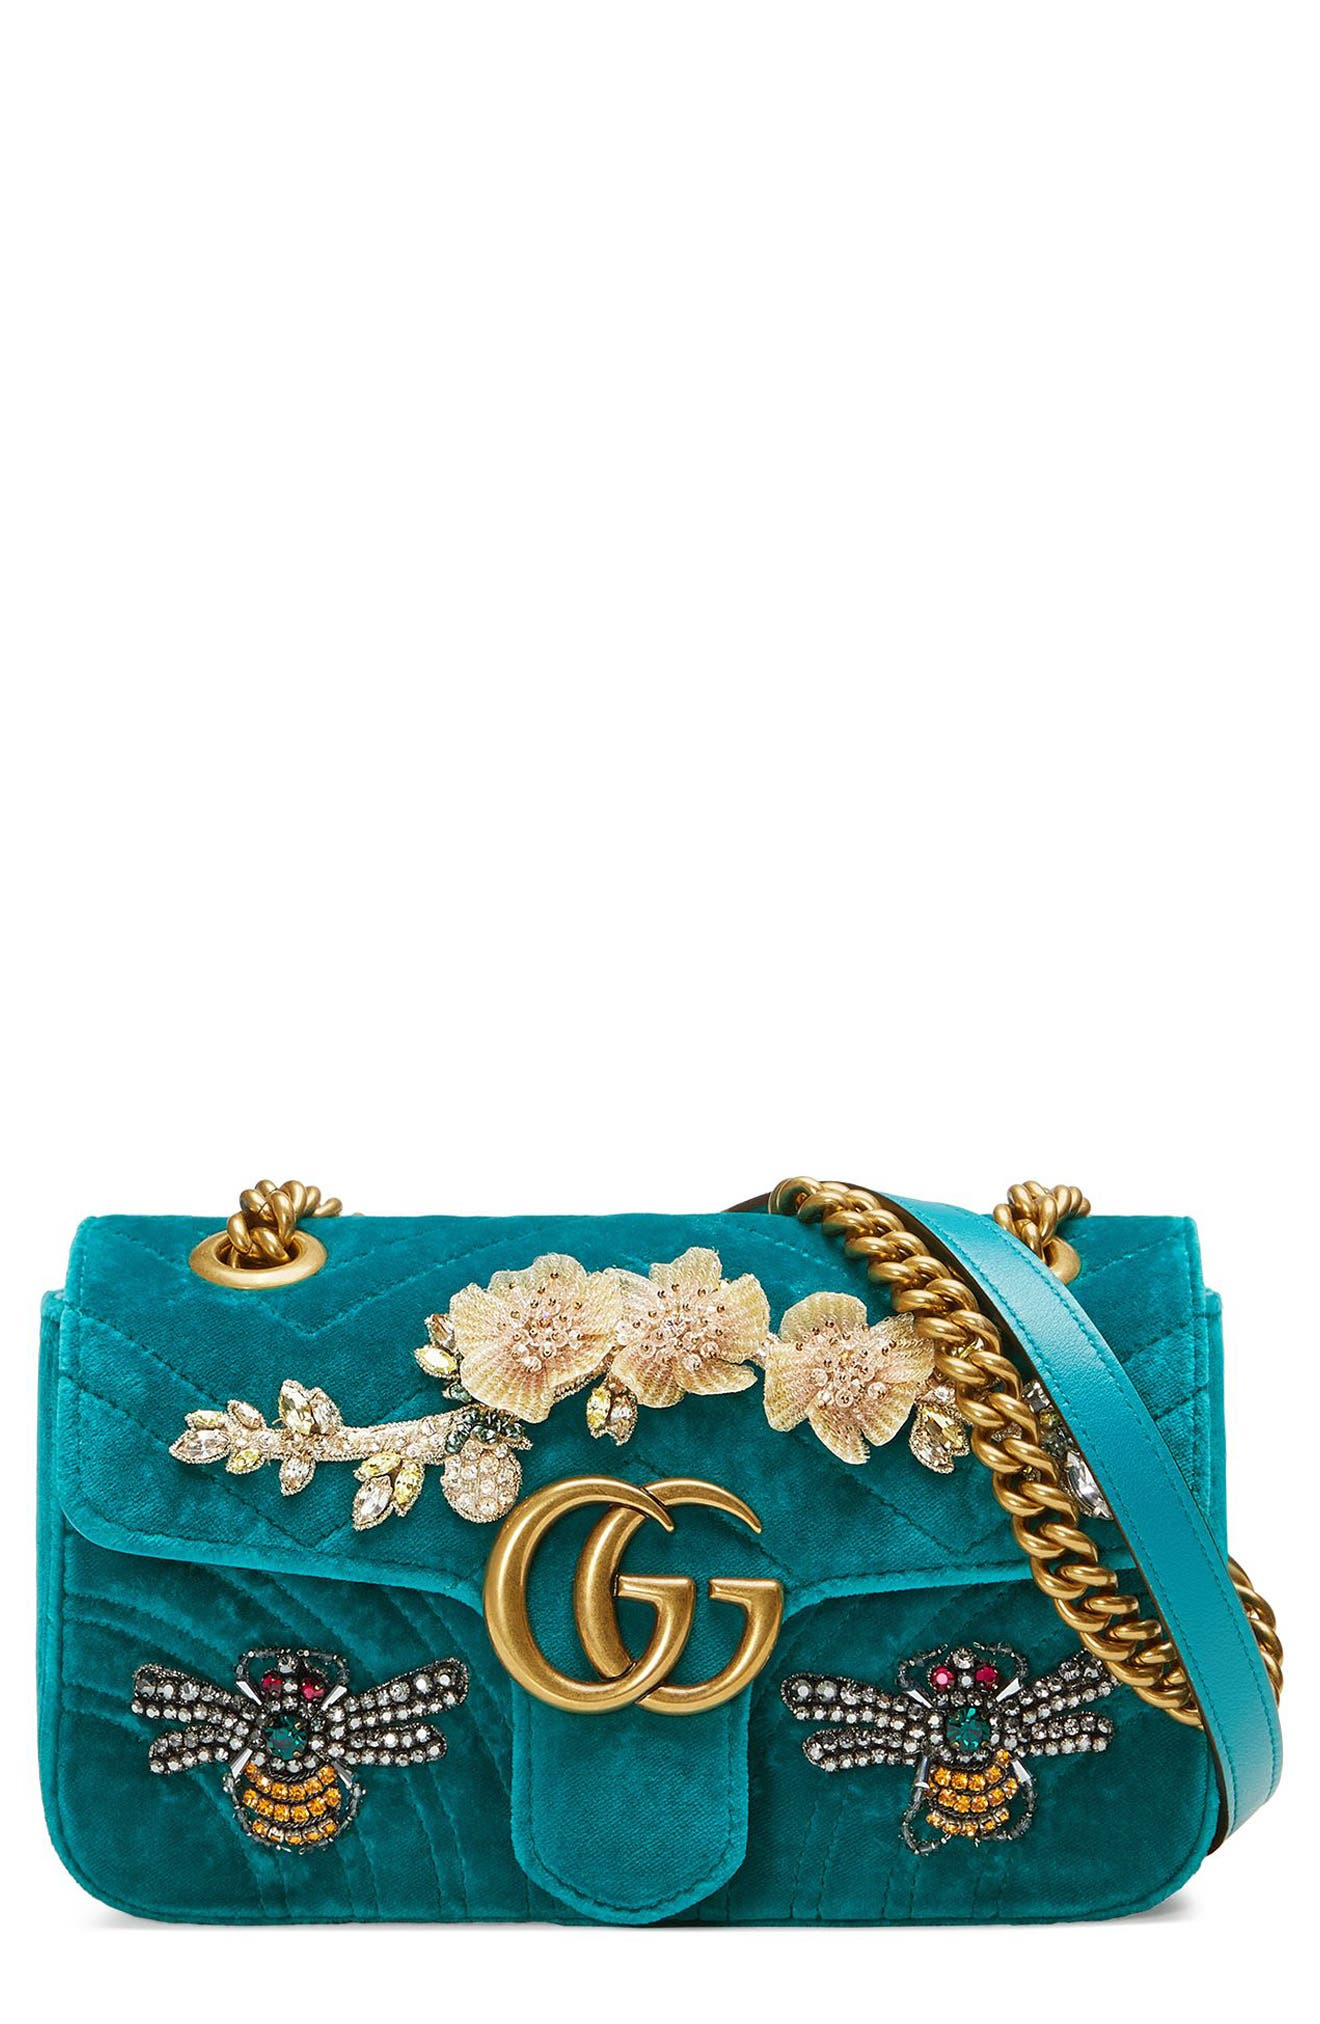 Alternate Image 1 Selected - Gucci Mini GG Marmont Matelassé Velvet Shoulder Bag